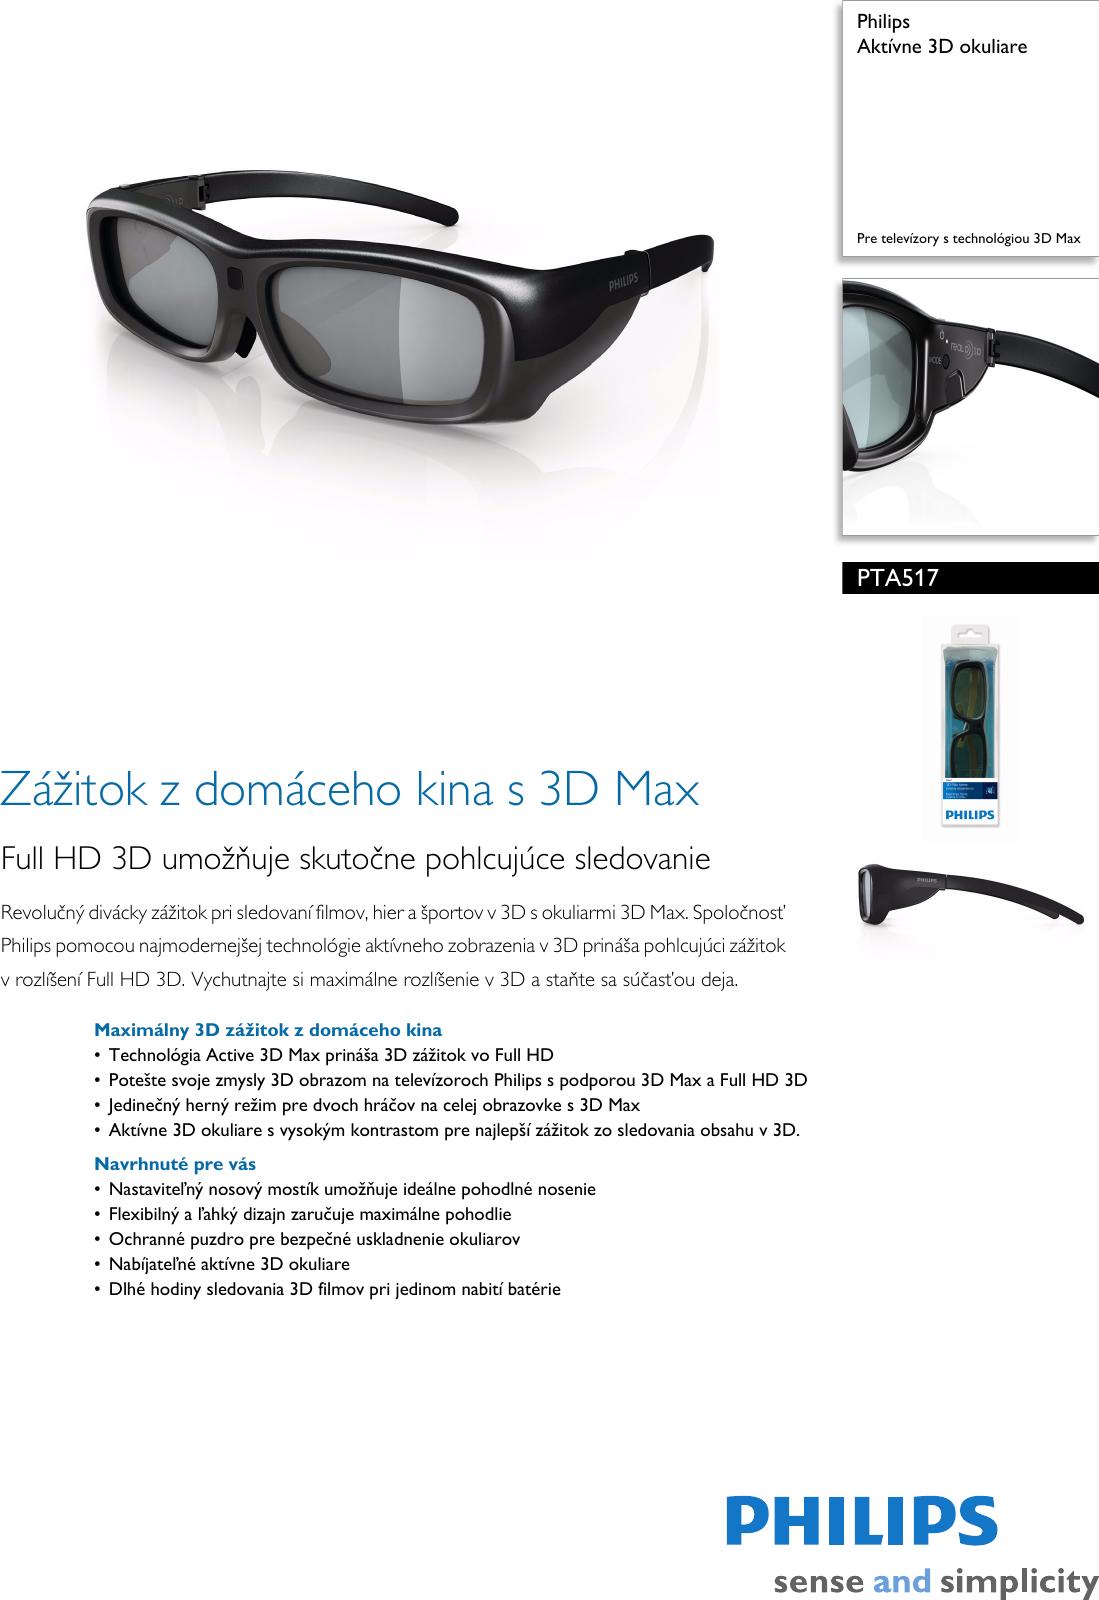 d329b1fb5 Philips PTA517/00 Aktívne 3D Okuliare User Manual Prospekt Pta517 00 Pss  Slksk